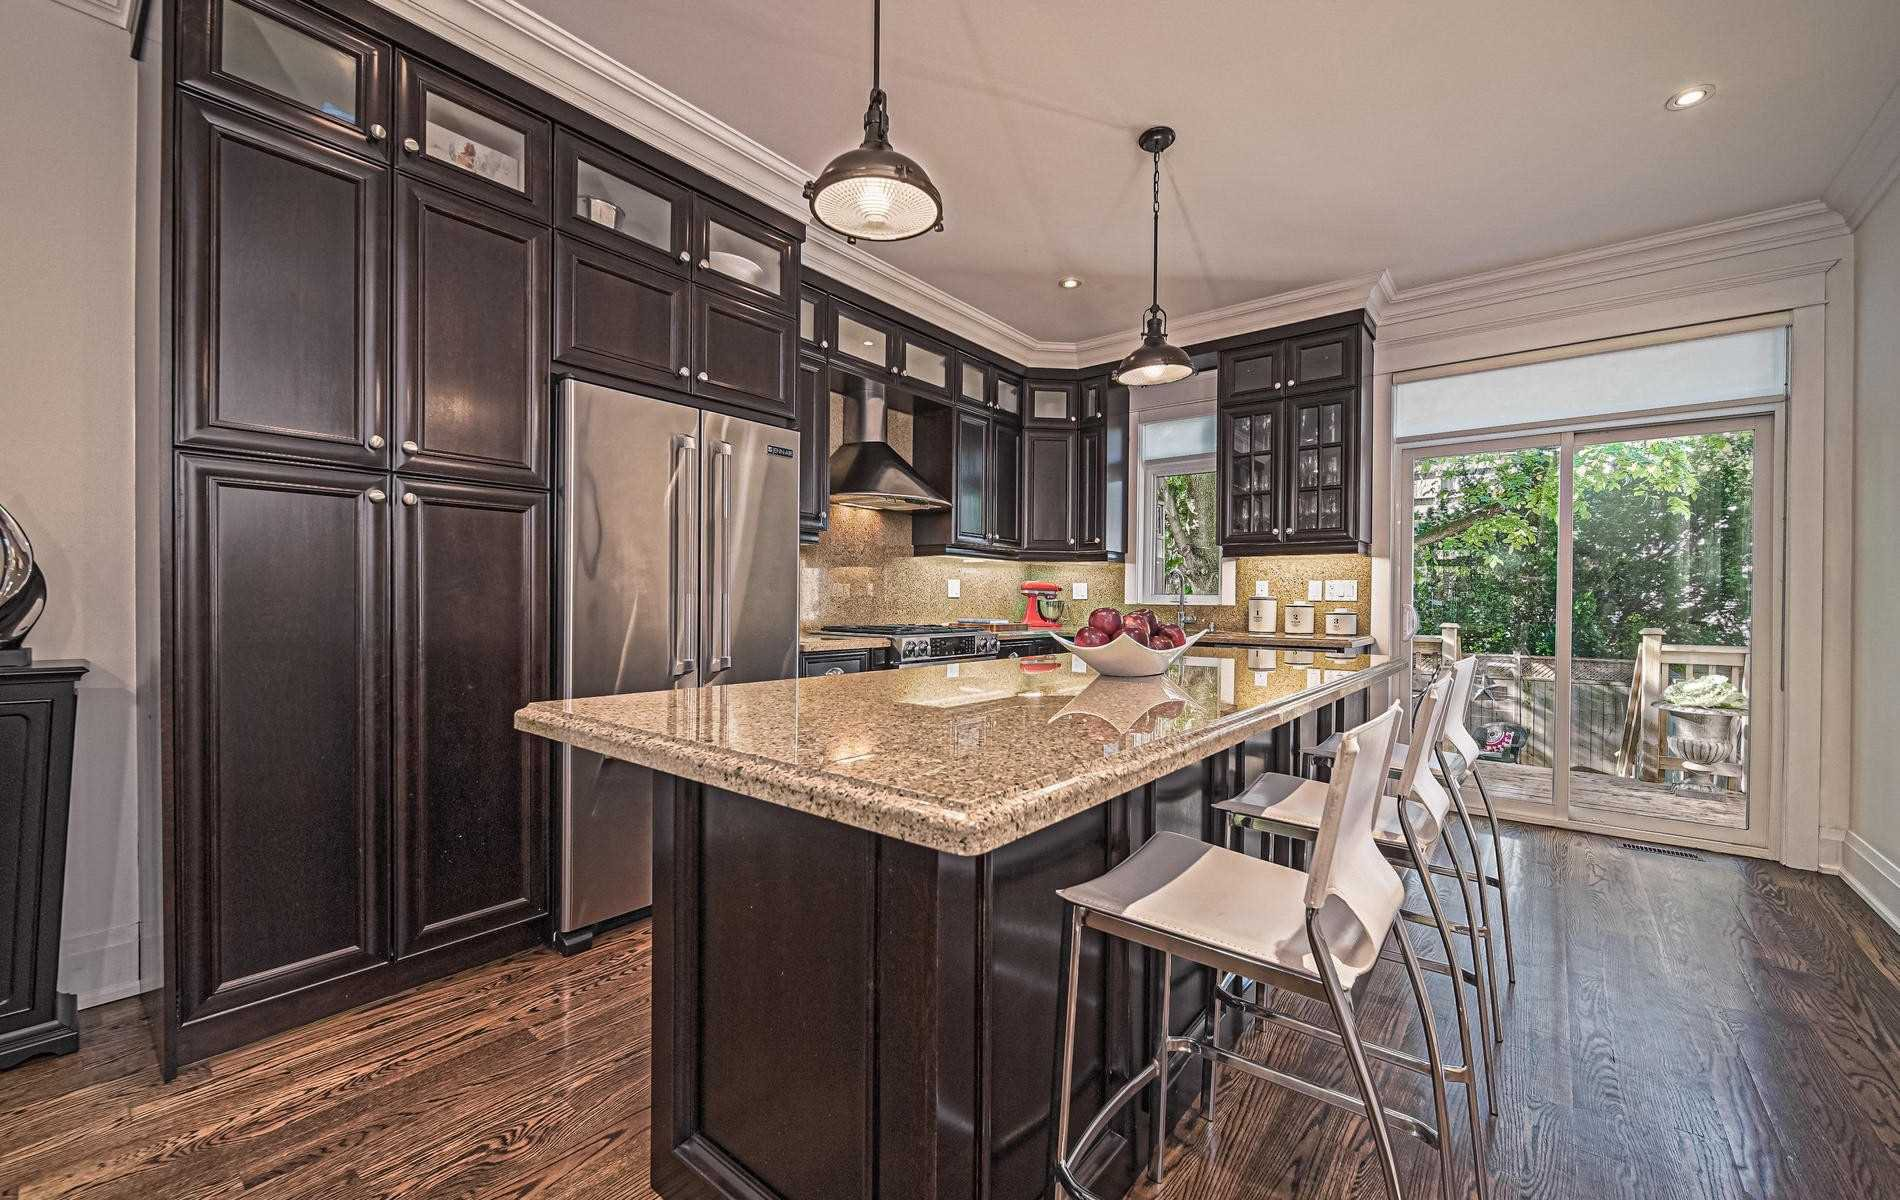 Photo 5: Photos: 216A Hamilton Street in Toronto: South Riverdale House (3-Storey) for sale (Toronto E01)  : MLS®# E4619870